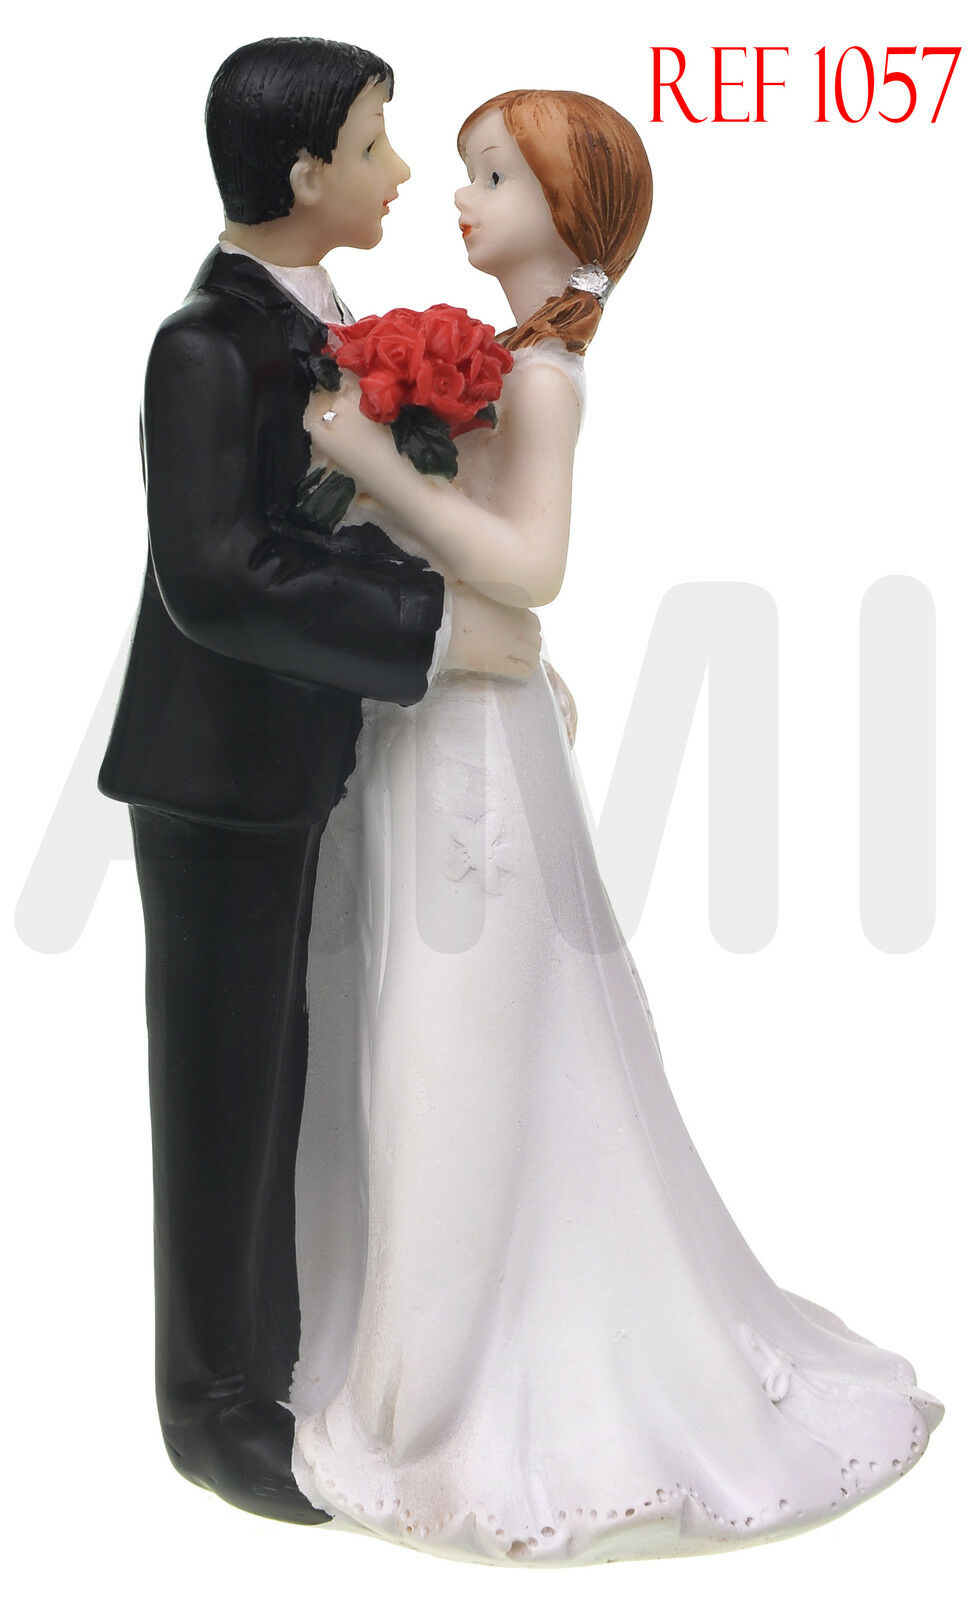 Clearance Sale Bride /& Groom Hugging Romantic Wedding Cake Topper UK Seller 1011